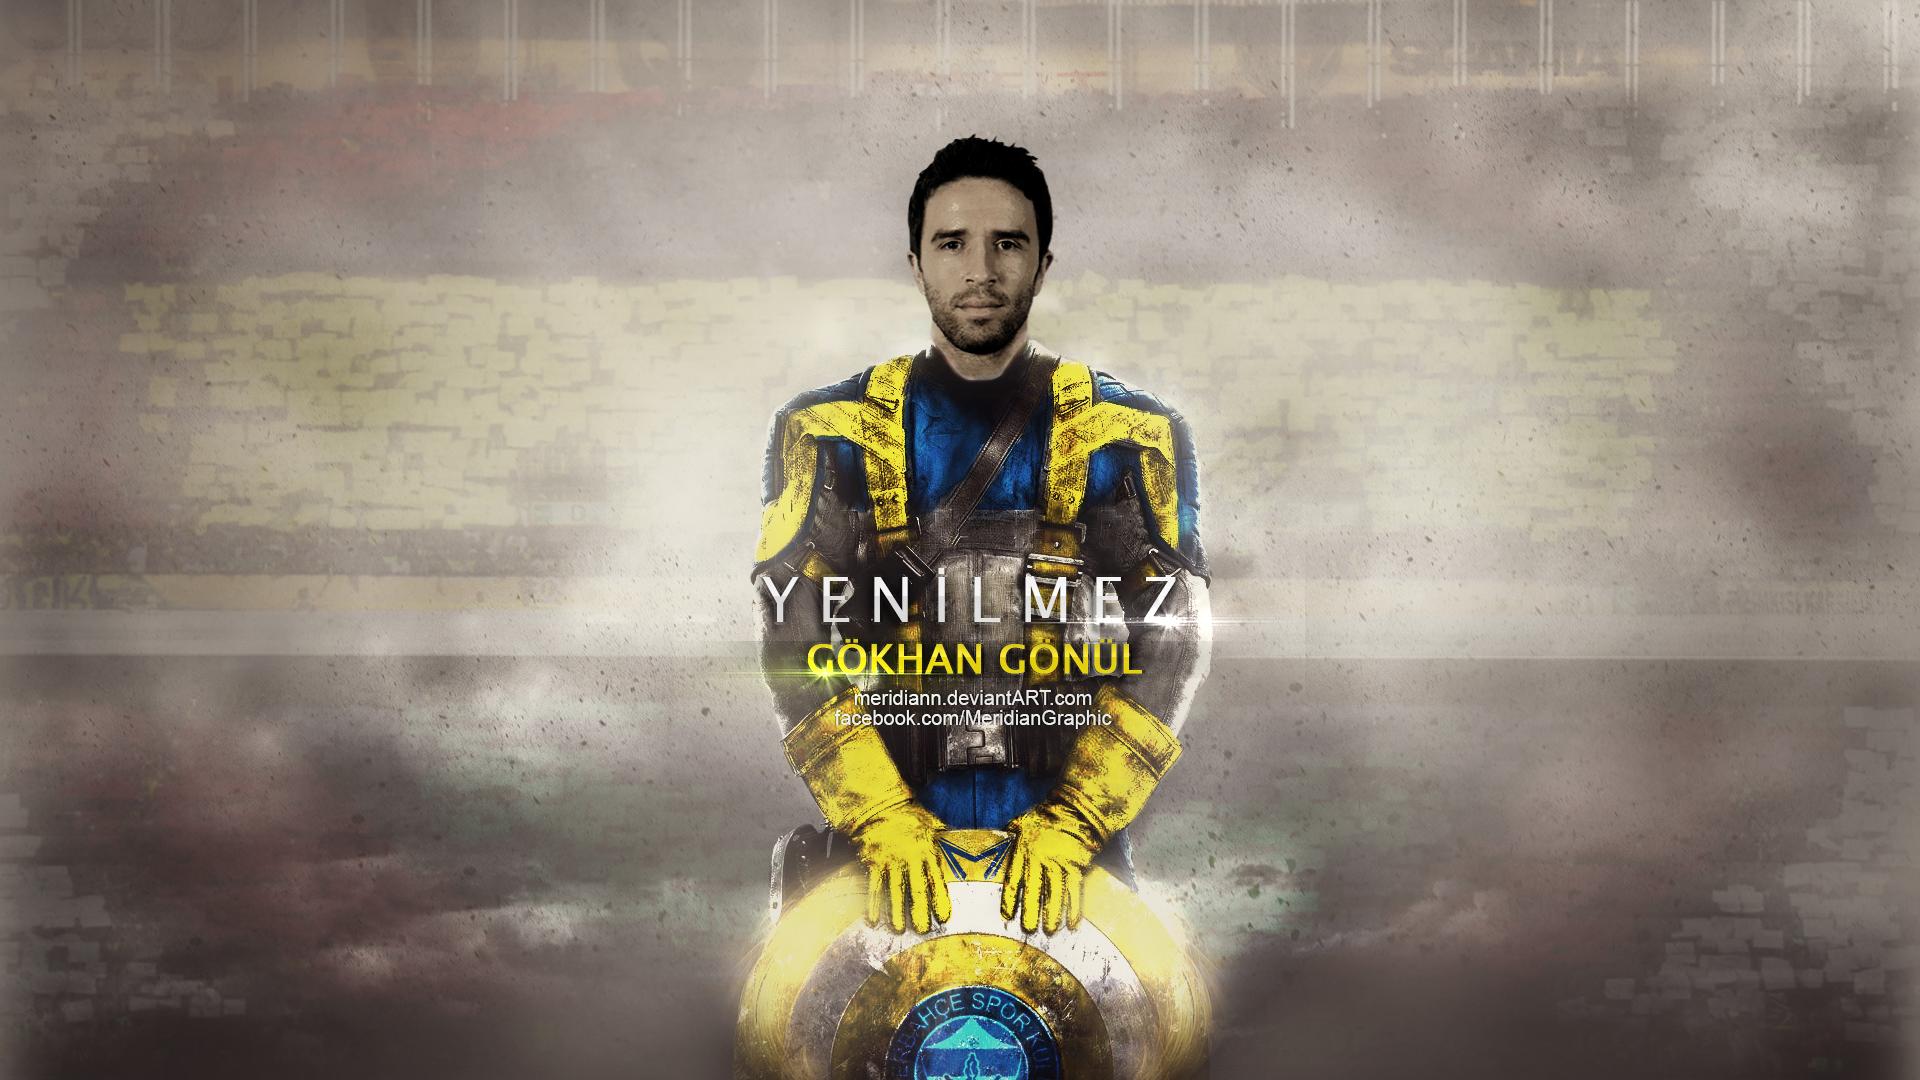 Yenilmez - Gokhan Gonul by Meridiann